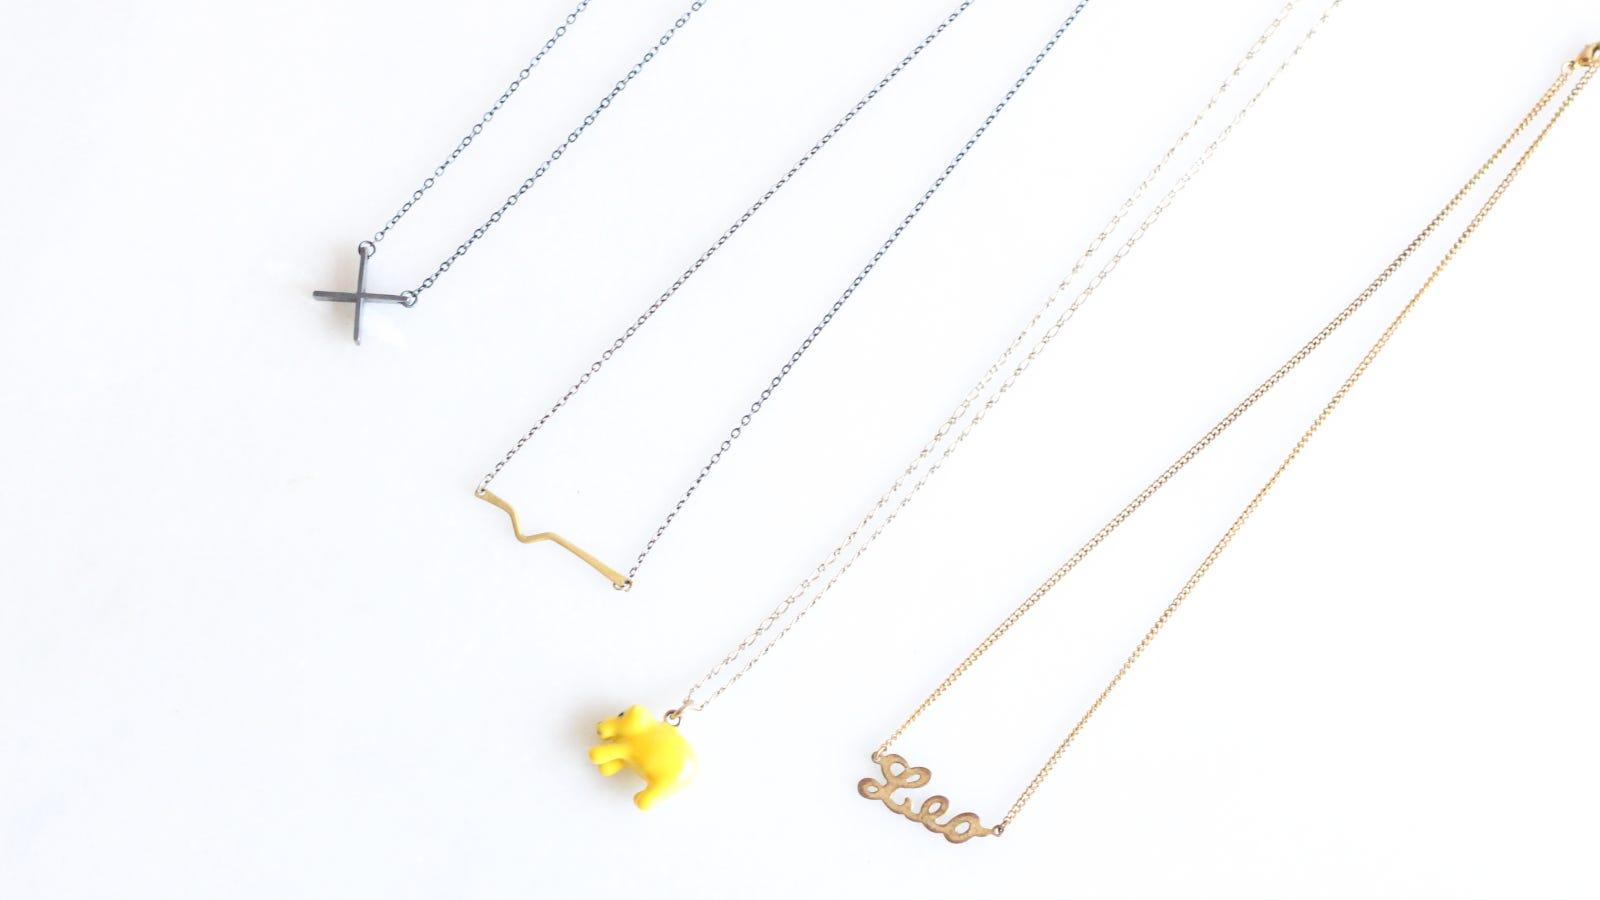 pack delicate necklaces using press  u0026 39 n u0026 39  seal wrap